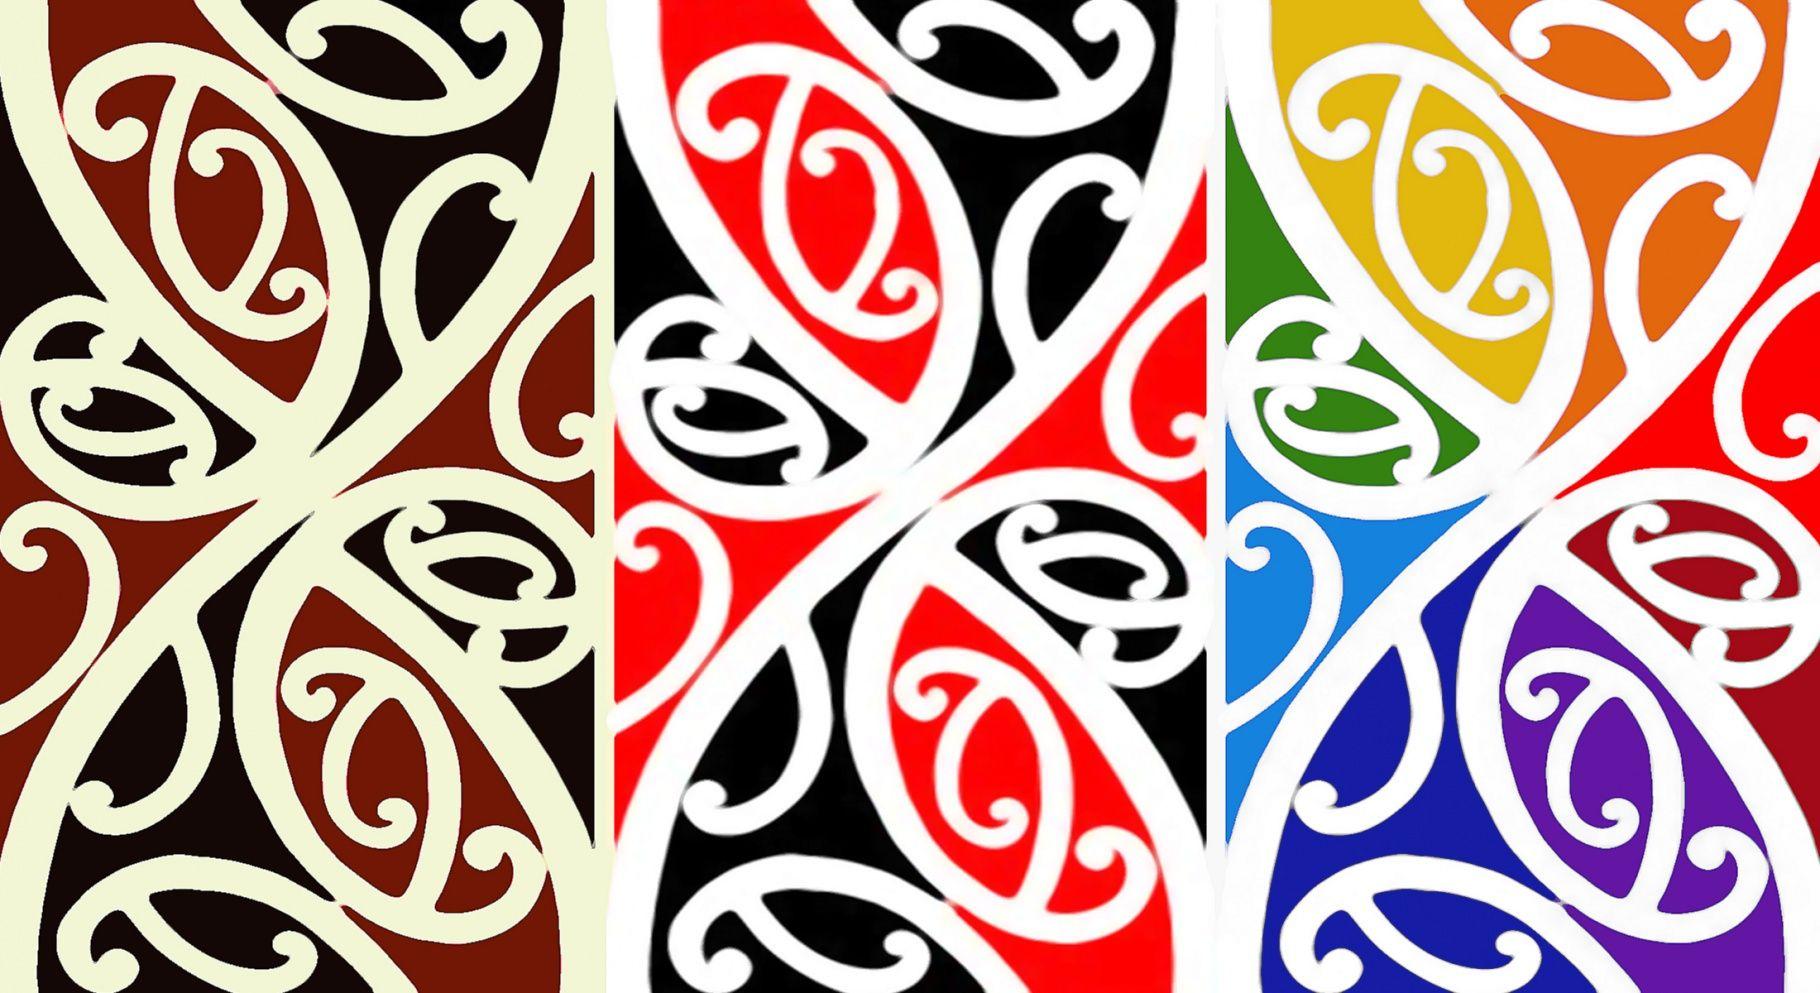 Pin By Amanda Beddis On Maori Patterns In